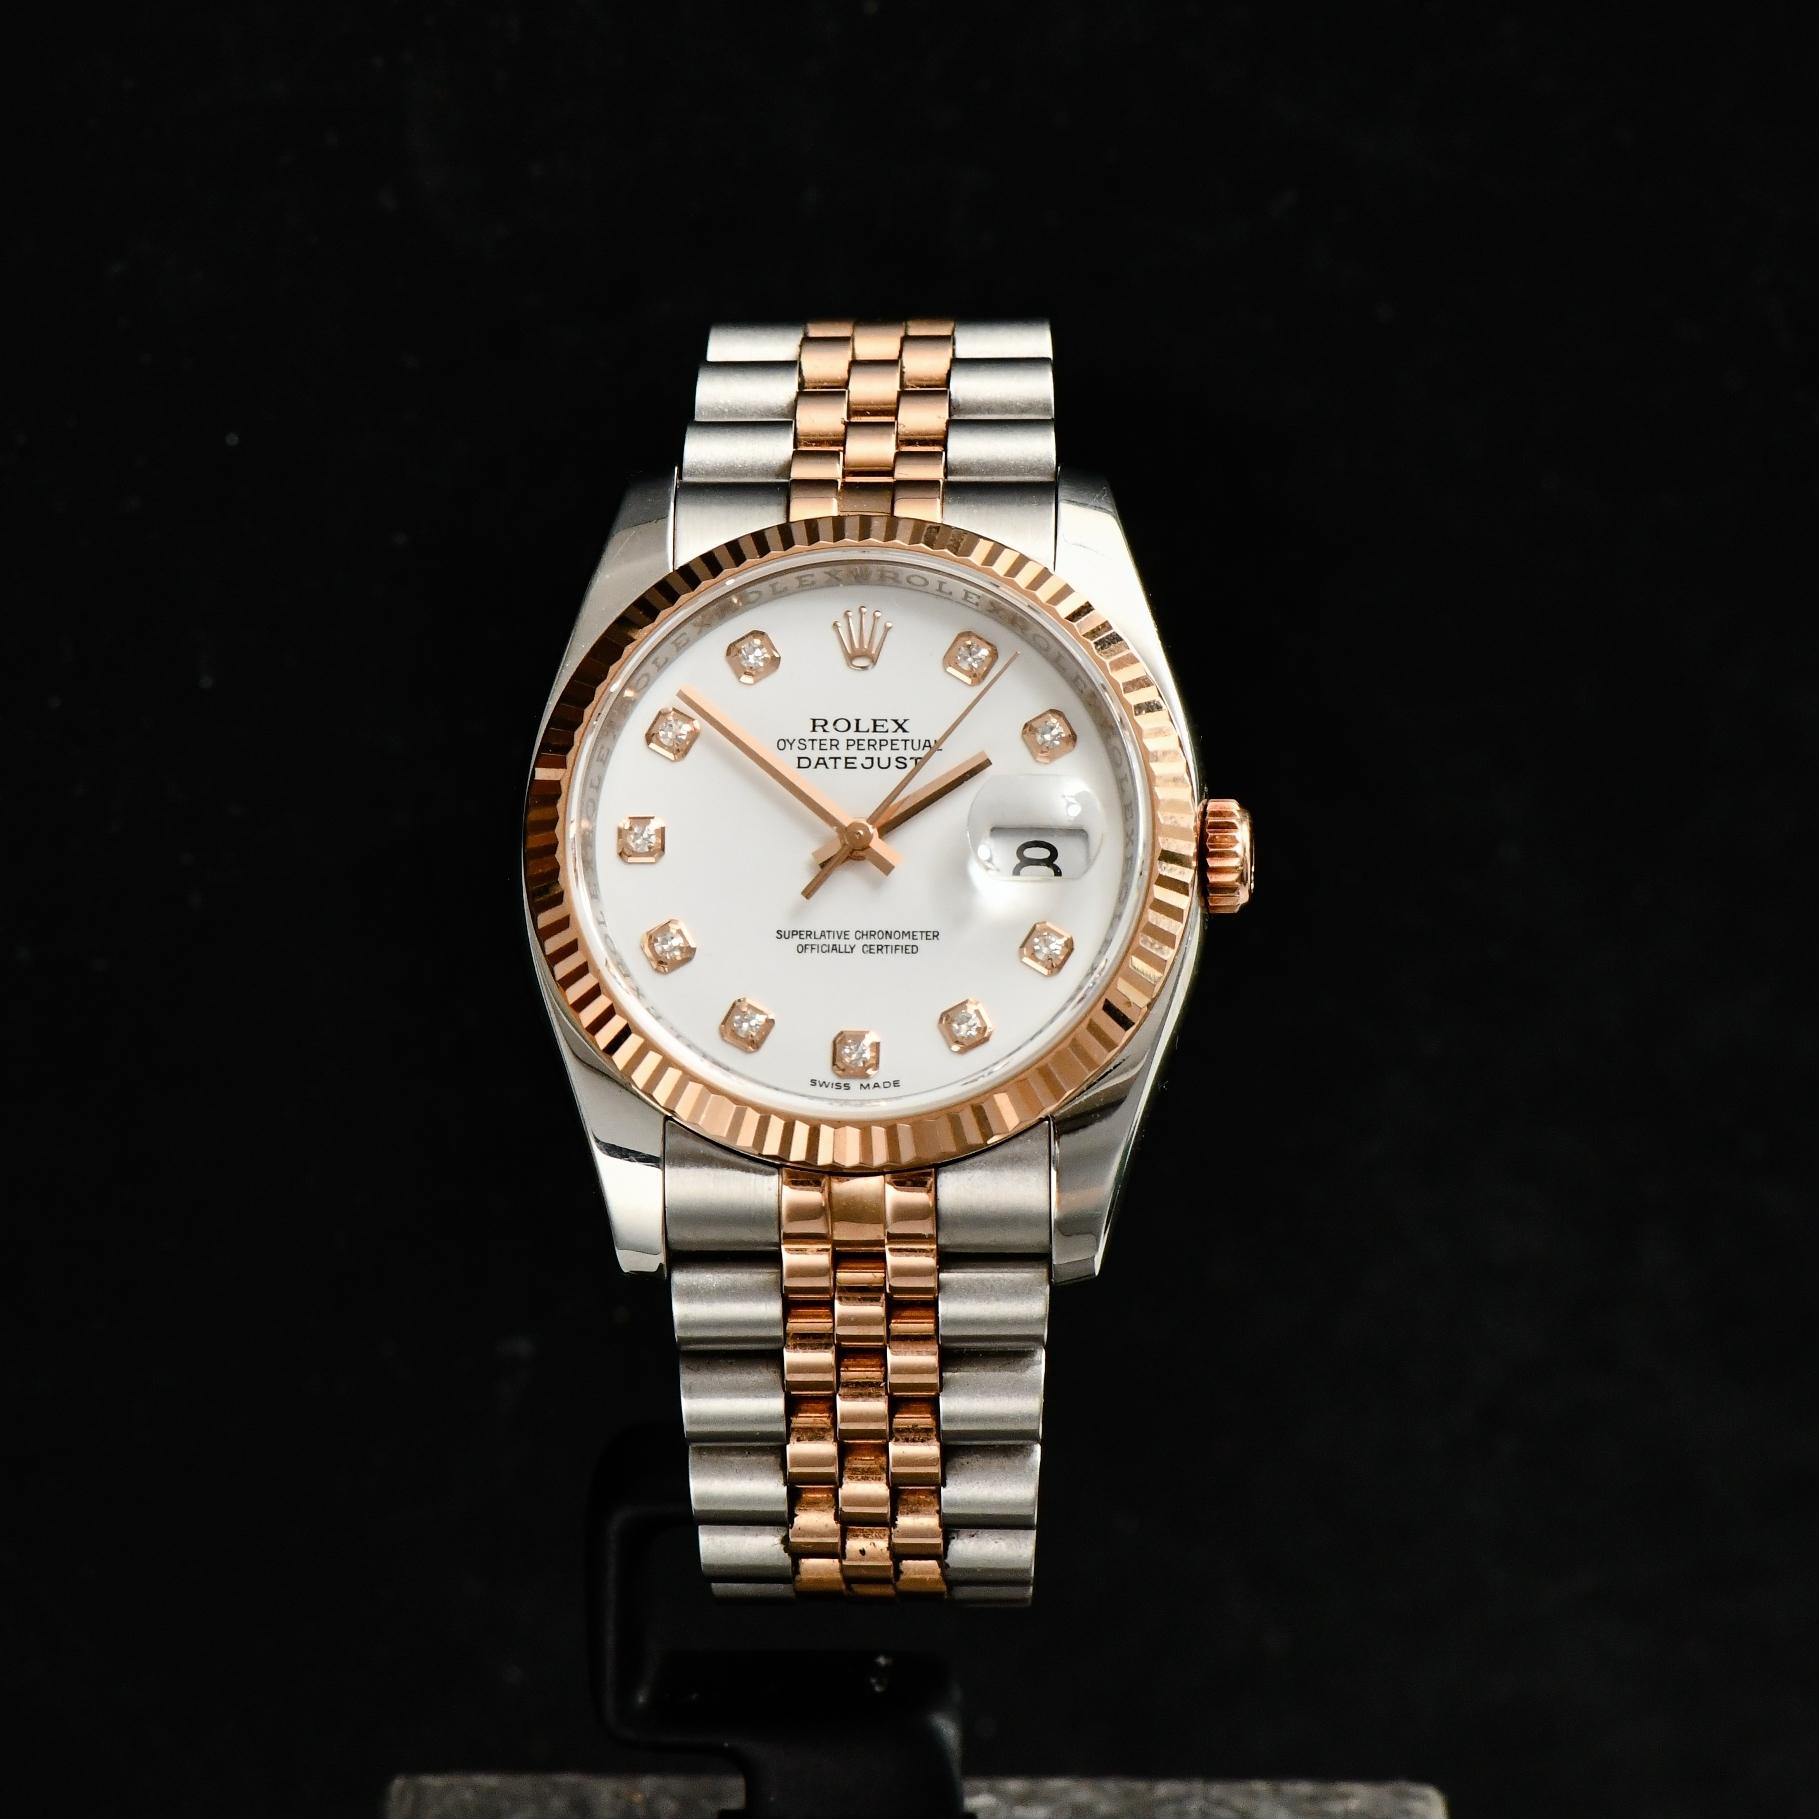 Rolex Dstejust 36m Steel & Pink Gold Jubilee White Diamond Dial